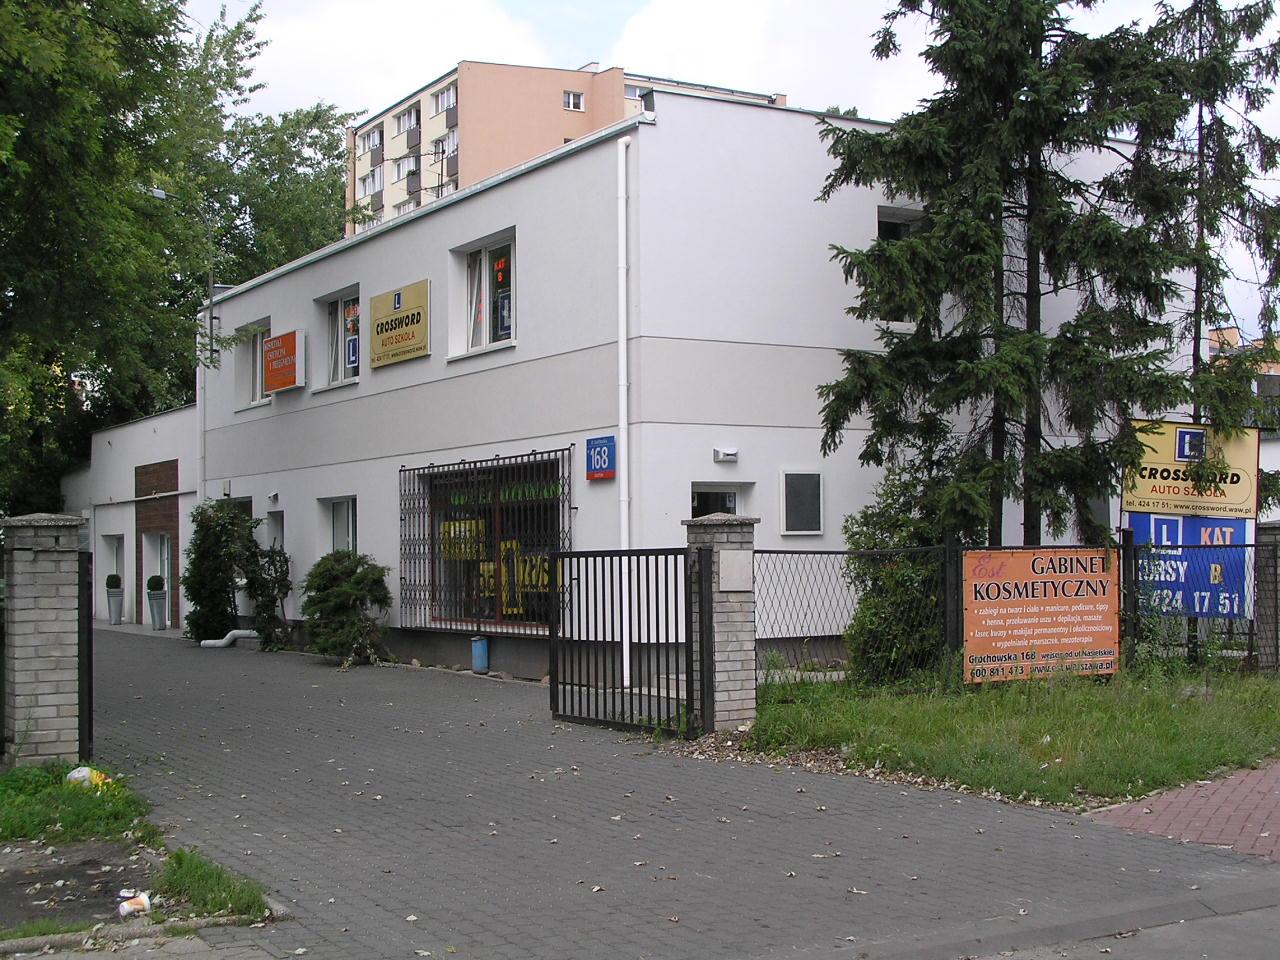 Grochowska 168